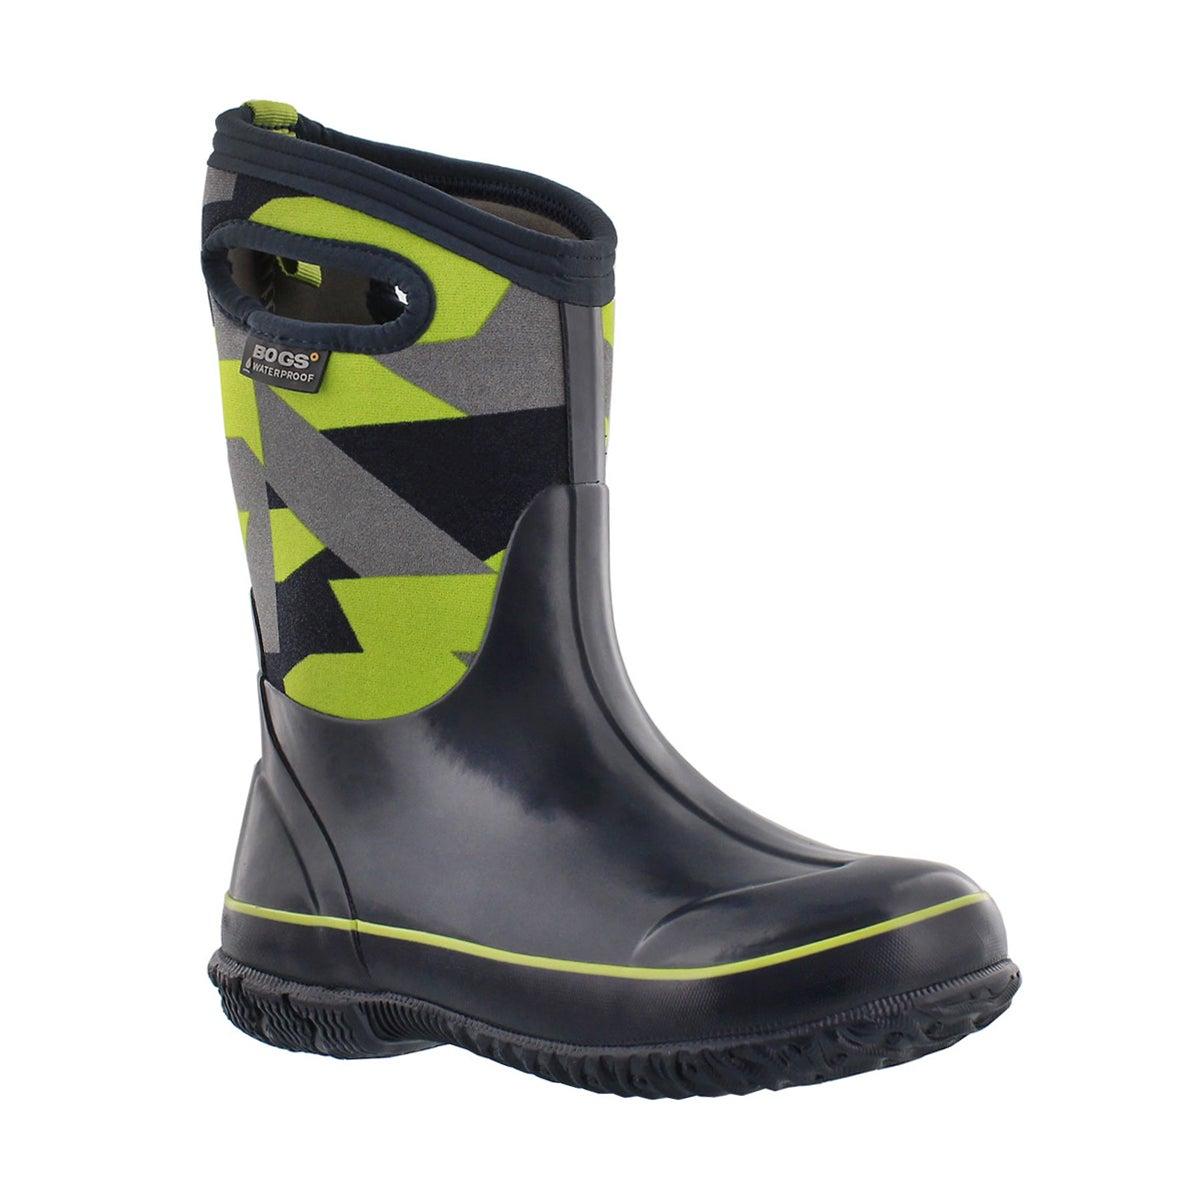 Boys' CLASSIC GEO blue/green waterproof boots